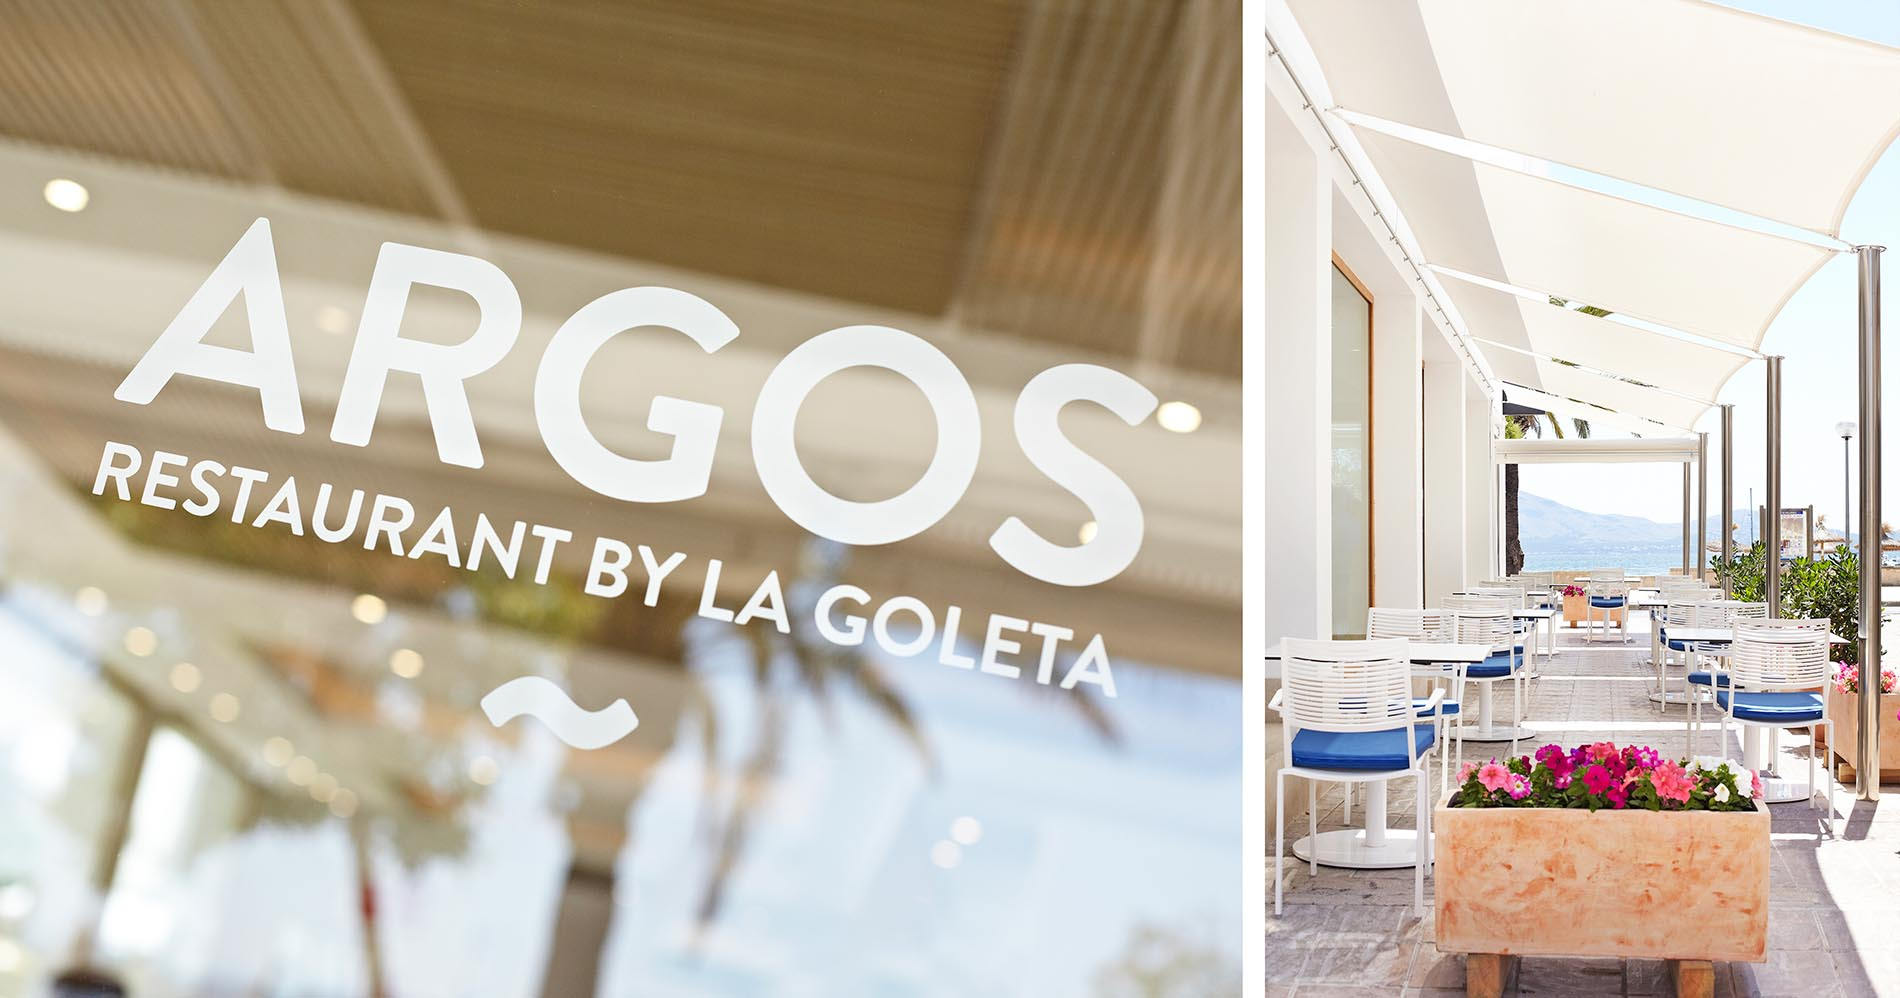 La Goleta hotel de mar branding argos restaurante